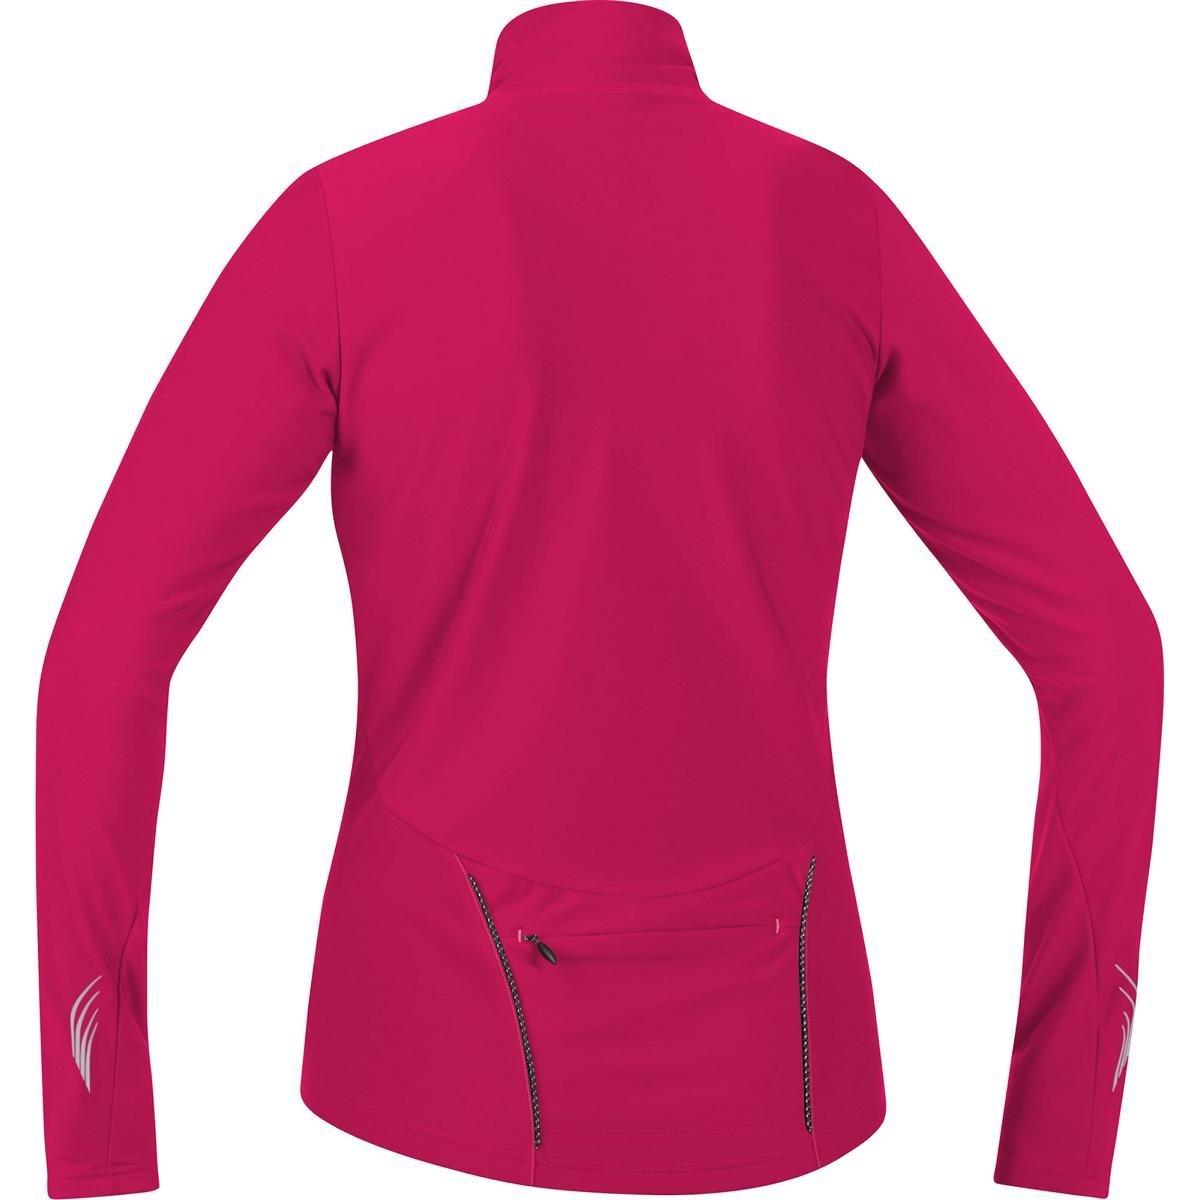 GORE WEAR Bustier Damen Funktionsunterwäsche Bustier WEAR und Top Element Thermo Jersey Bustiers & Tops 1a3087